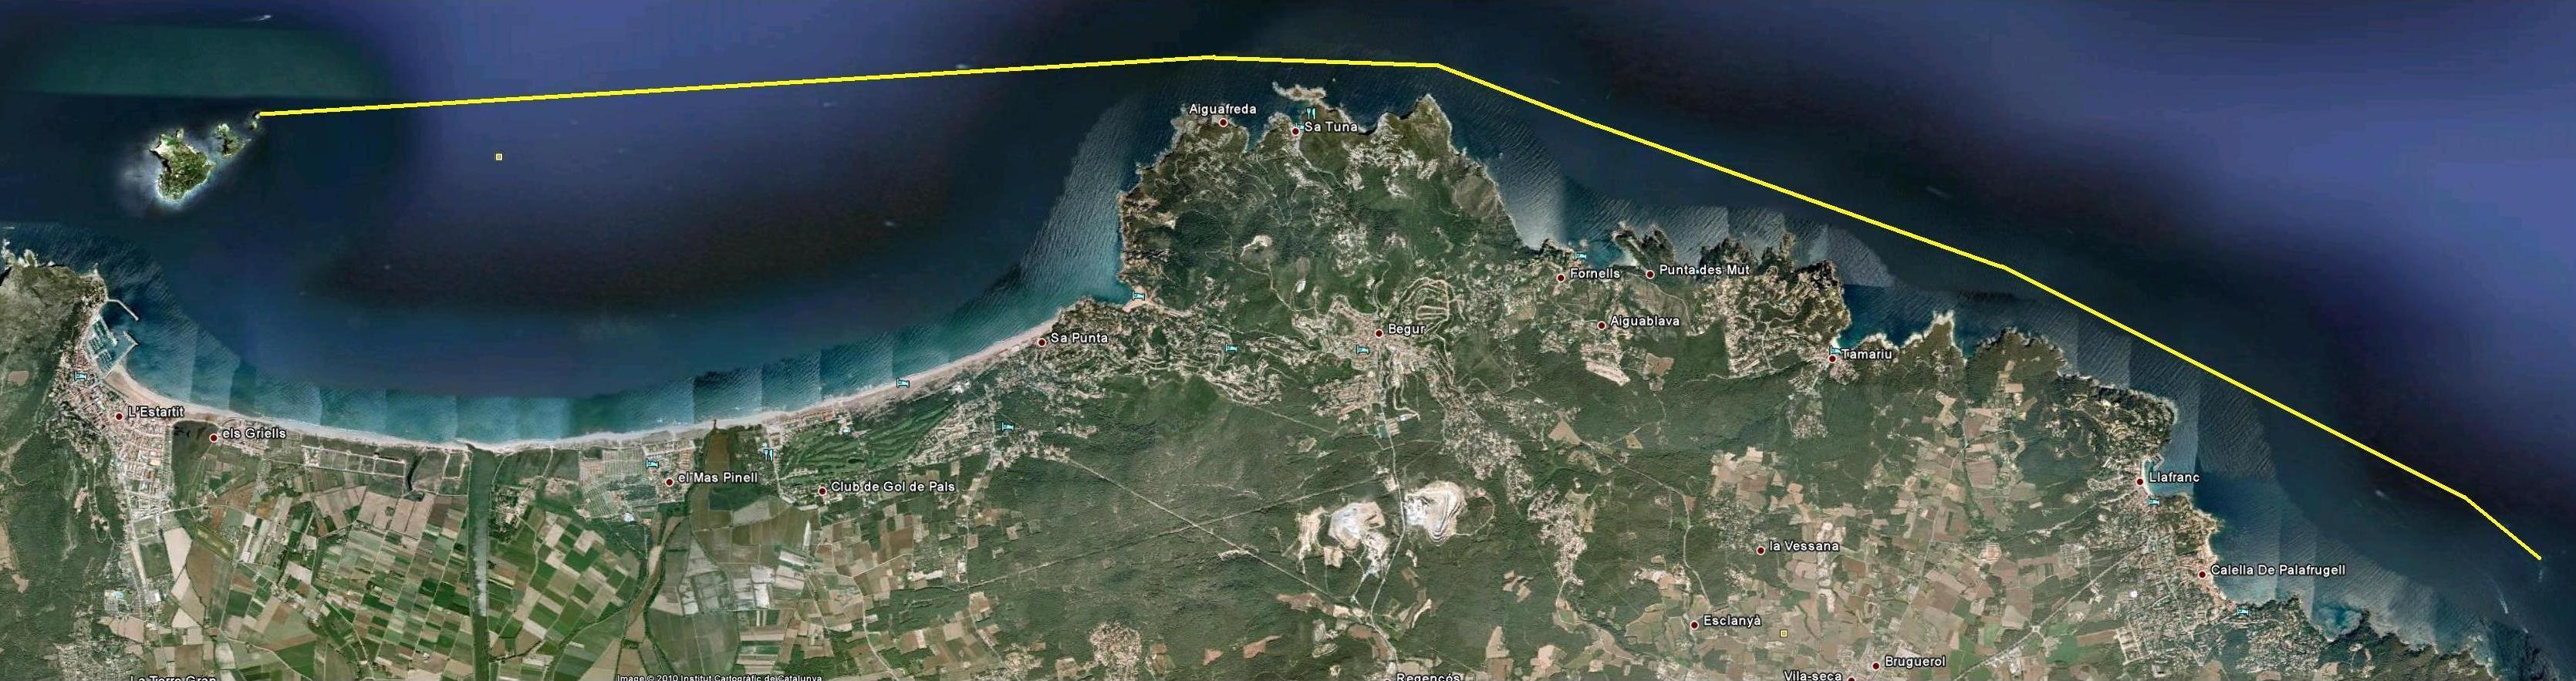 illes_medes-illes_formigues